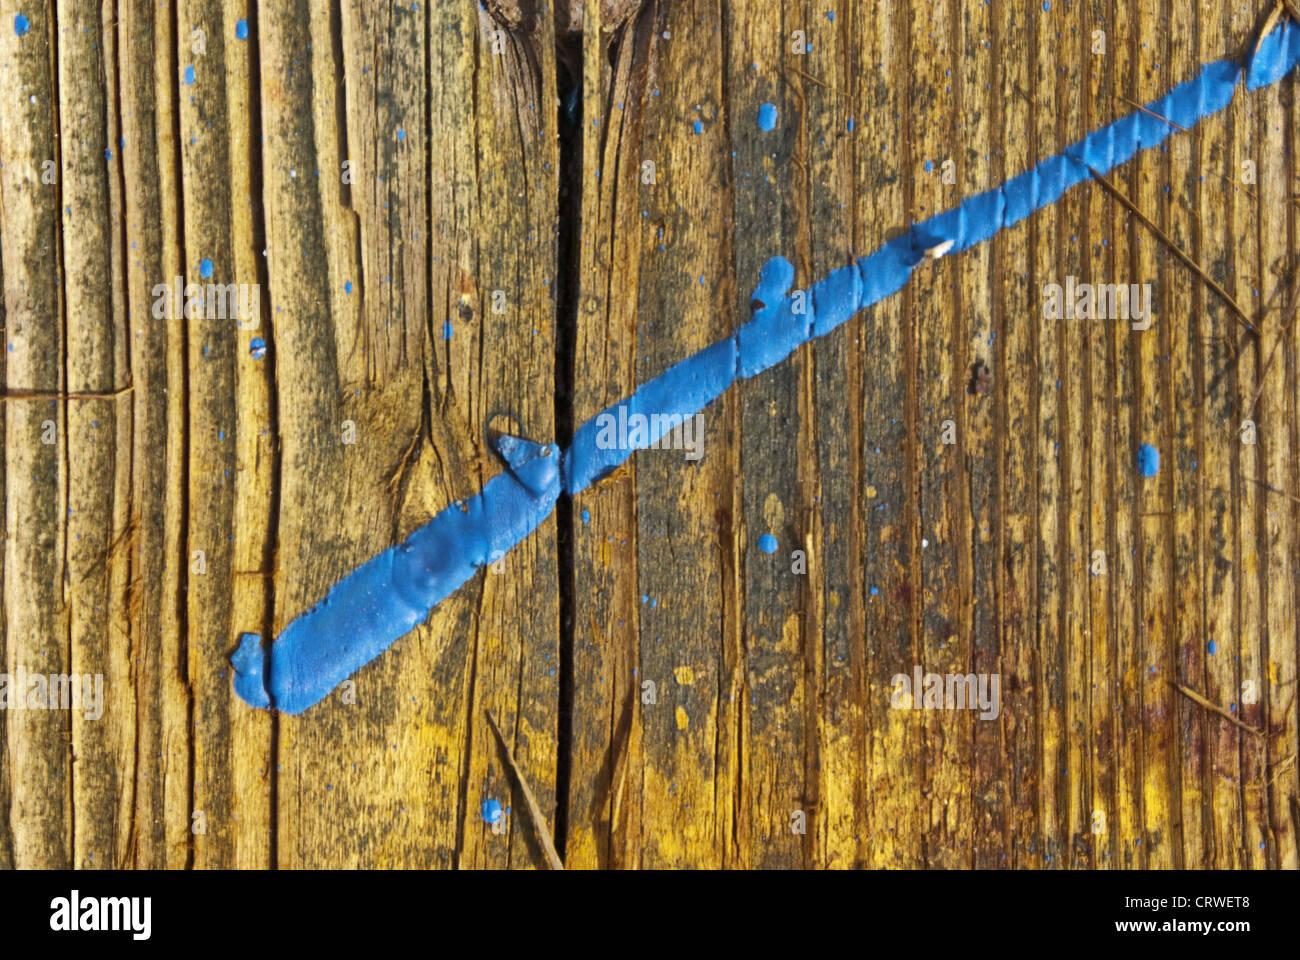 Blue splash of color on boards Stock Photo